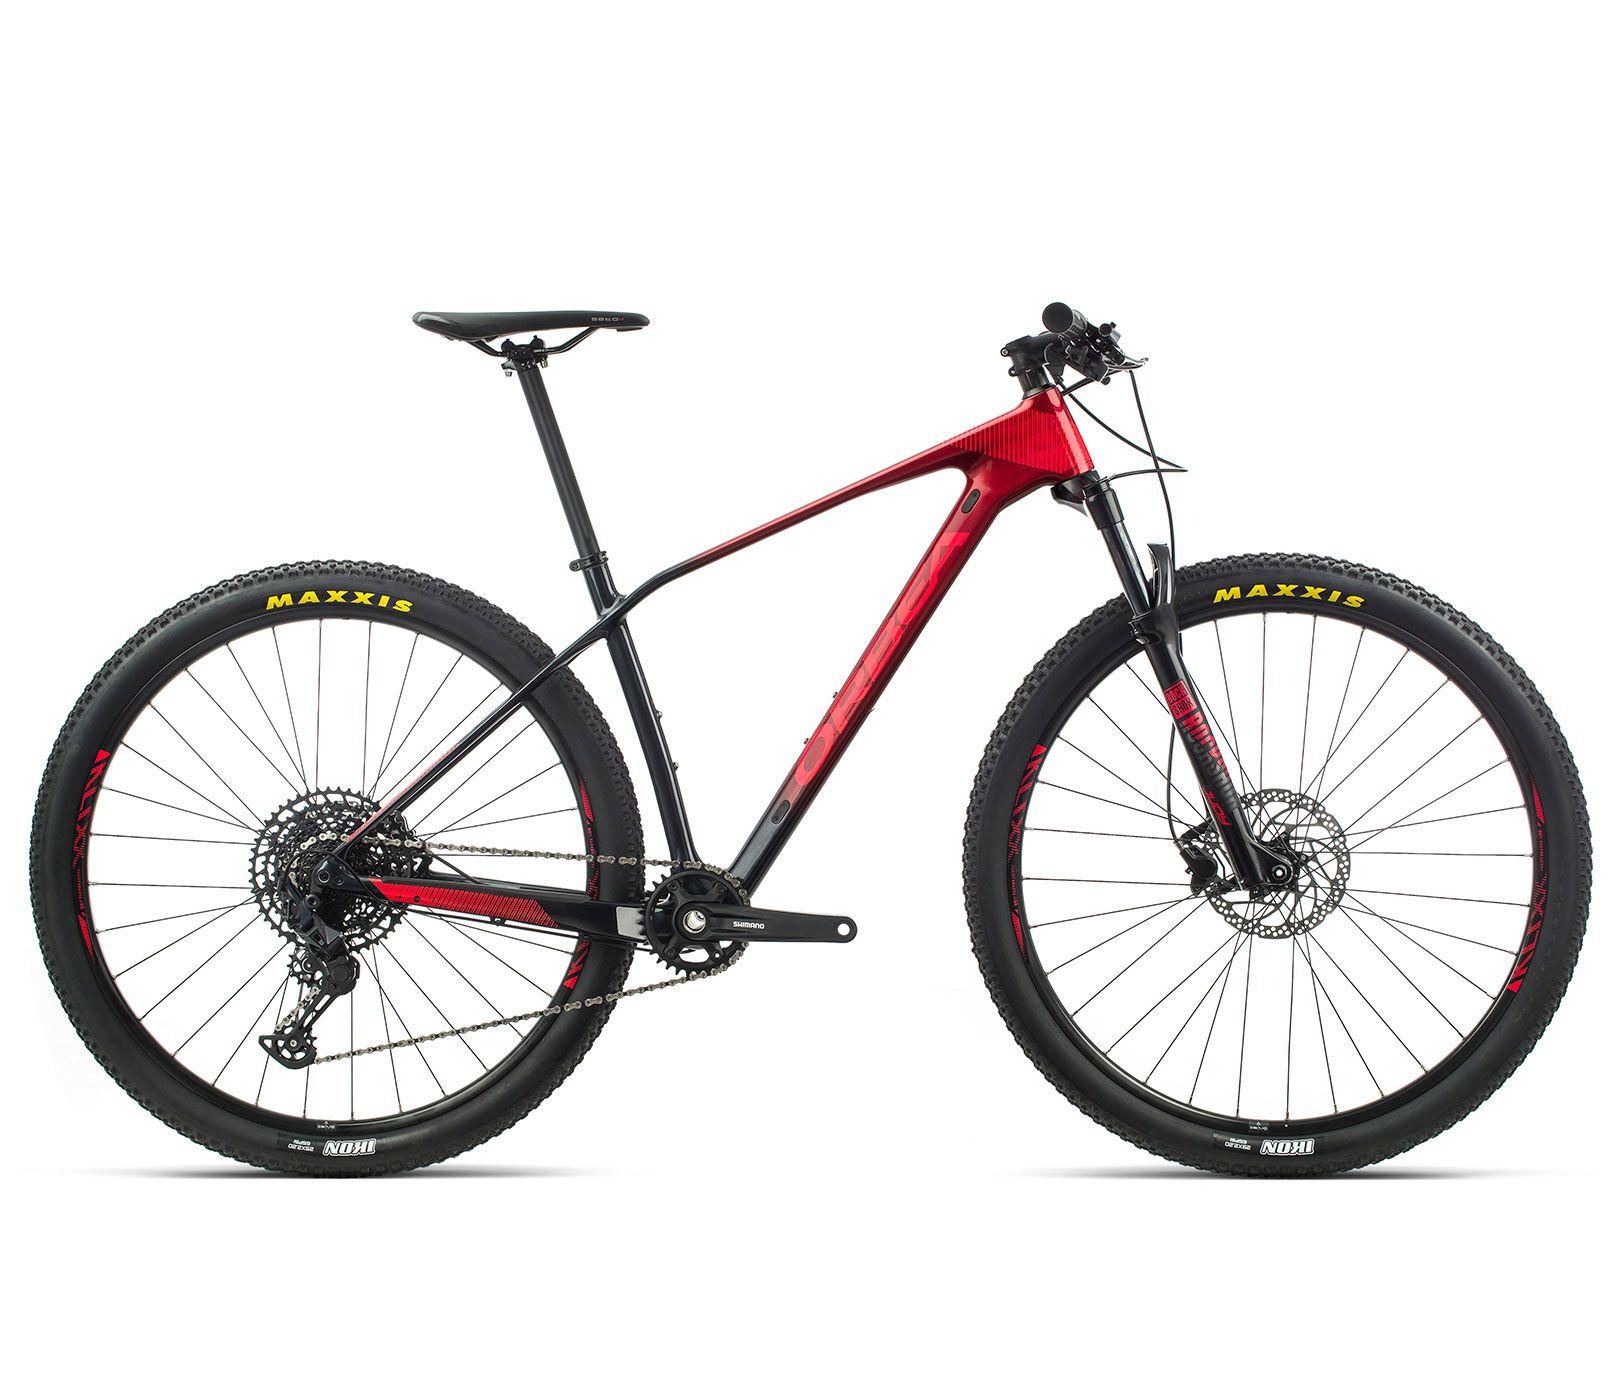 Bicicleta MTB Orbea Alma 29 M50 - Tam L - Verm/Preta 2020